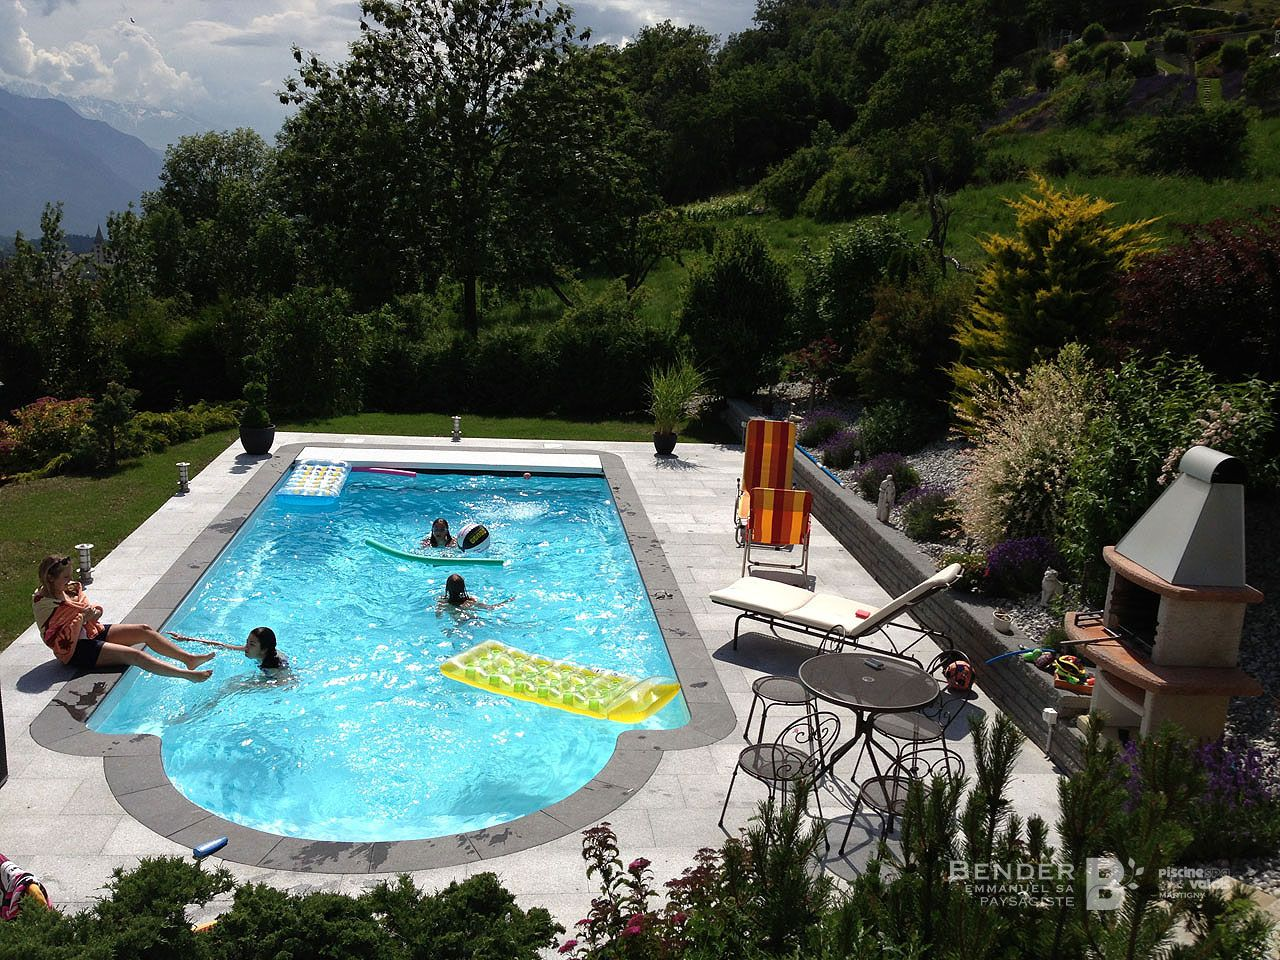 Nos r alisations bender paysagisme for Meilleure piscine coque